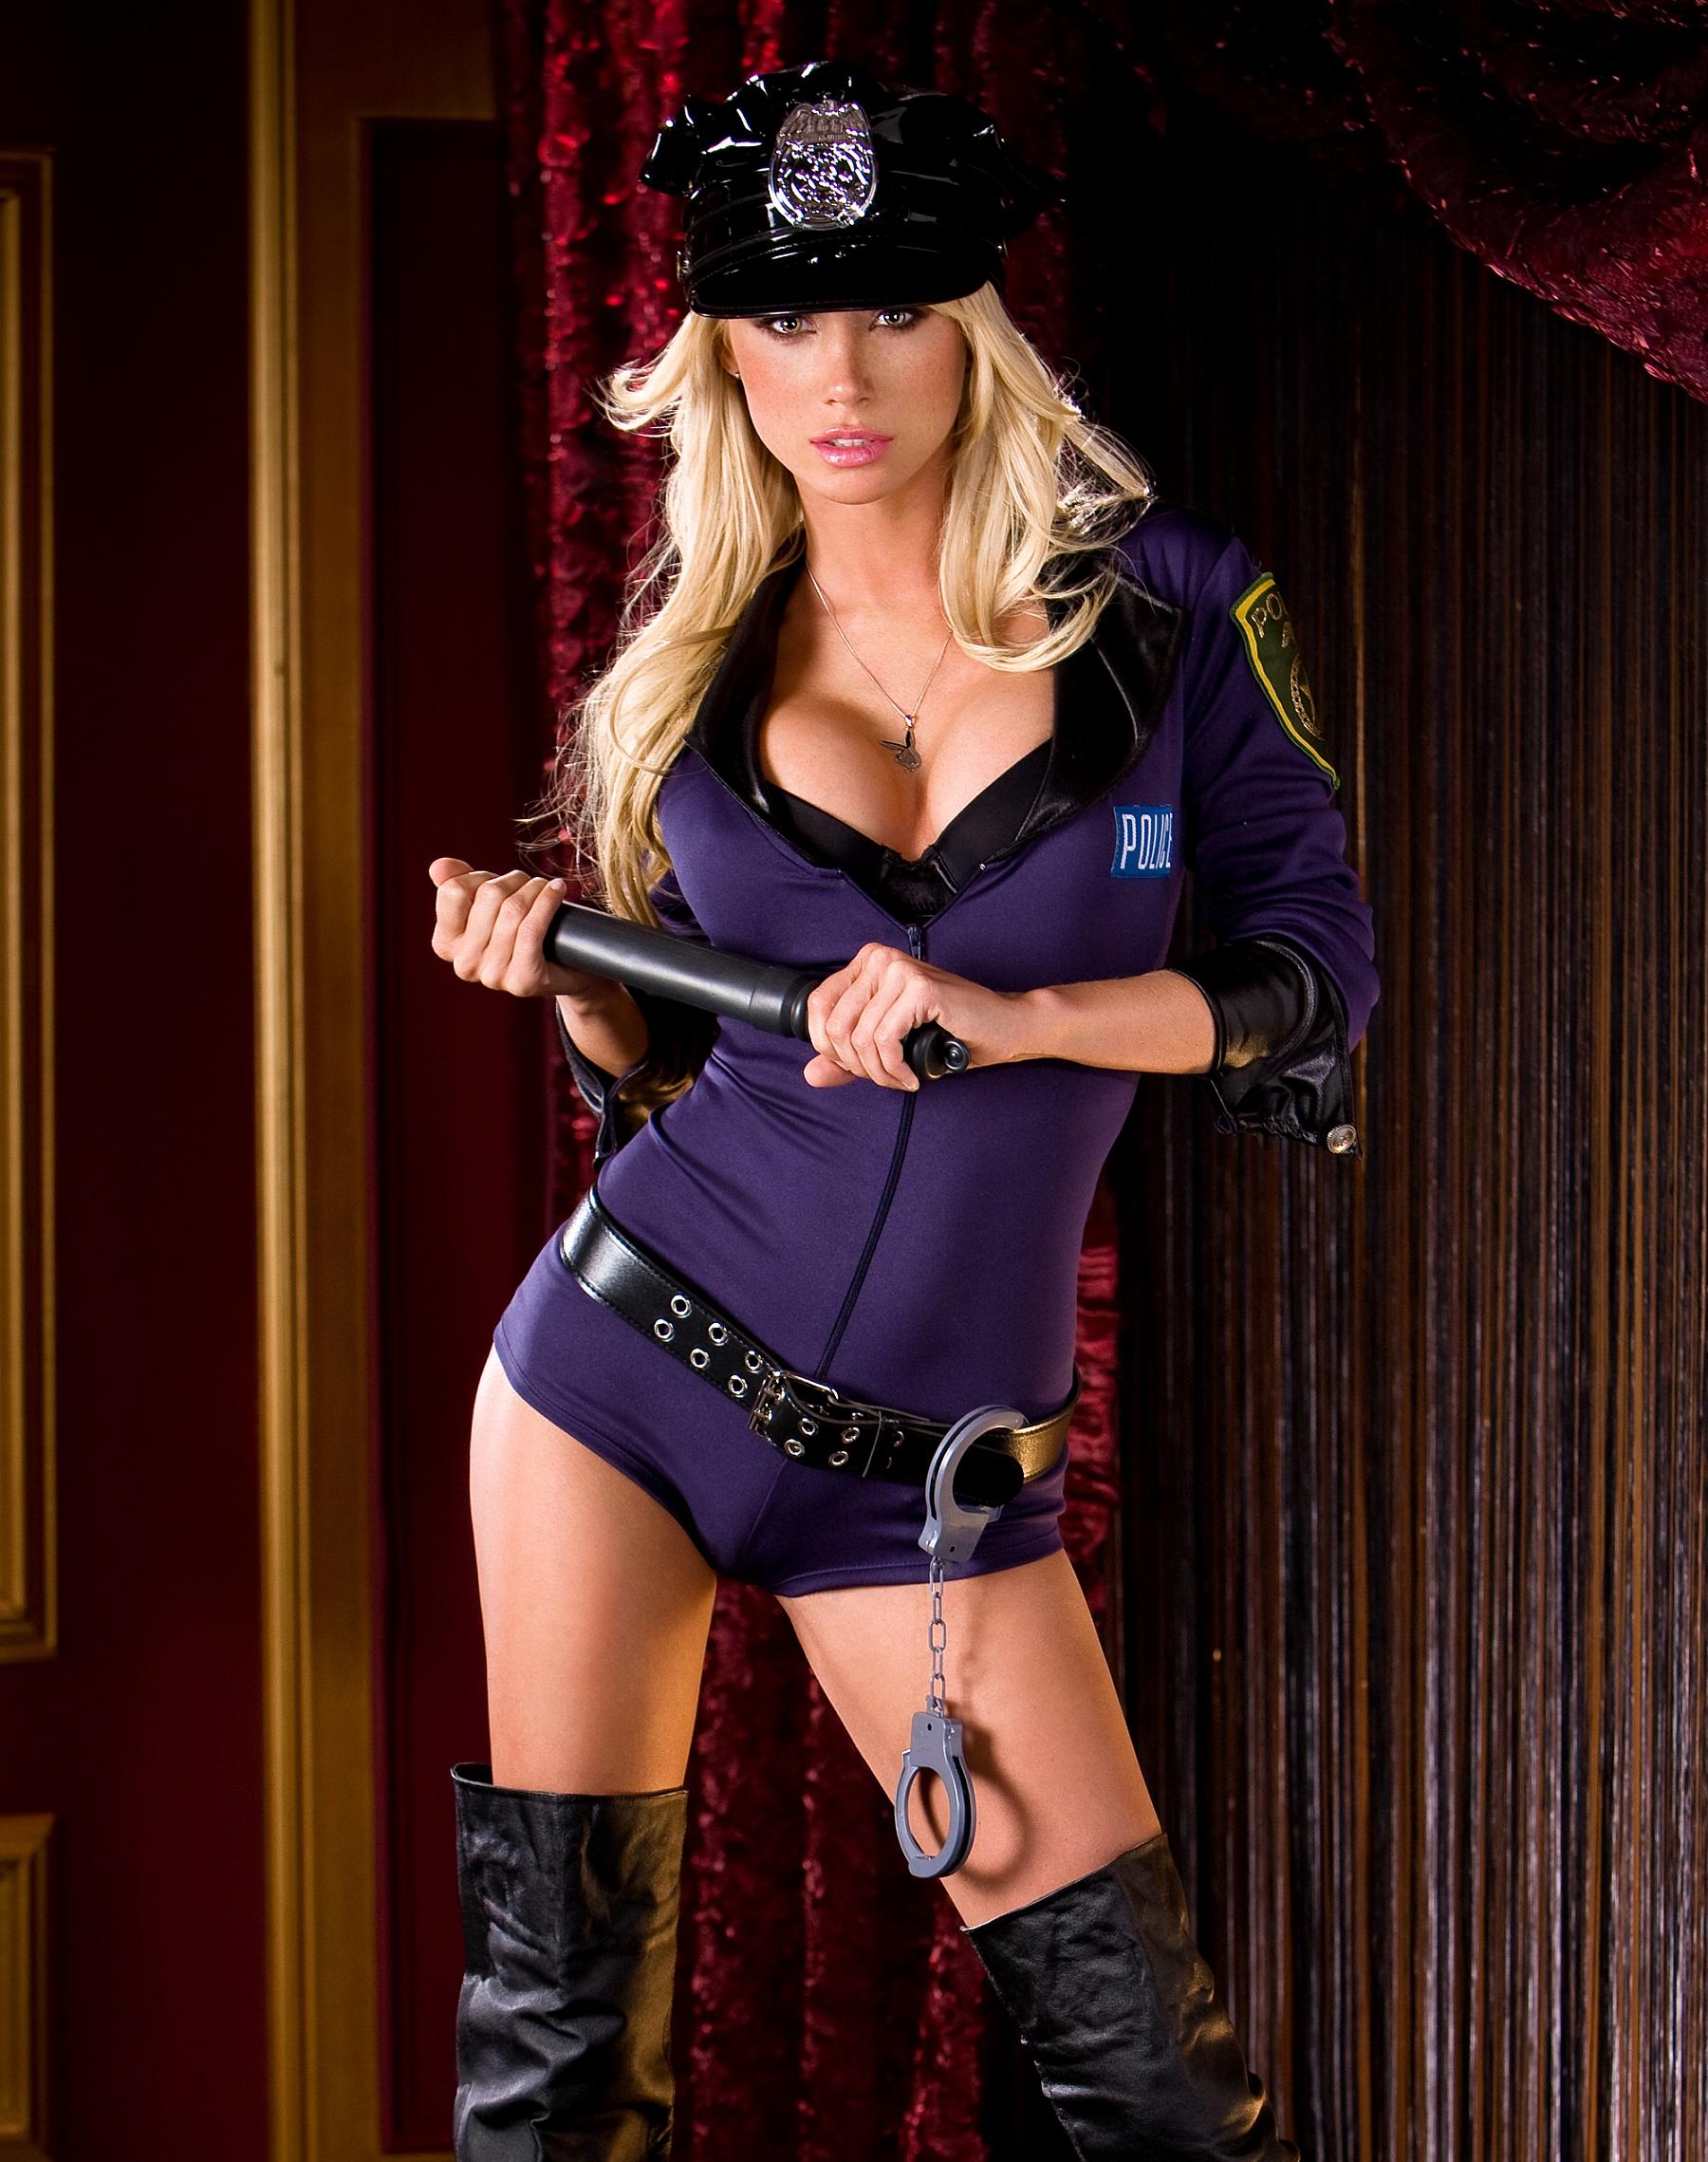 foto-seksualnie-politseyskie